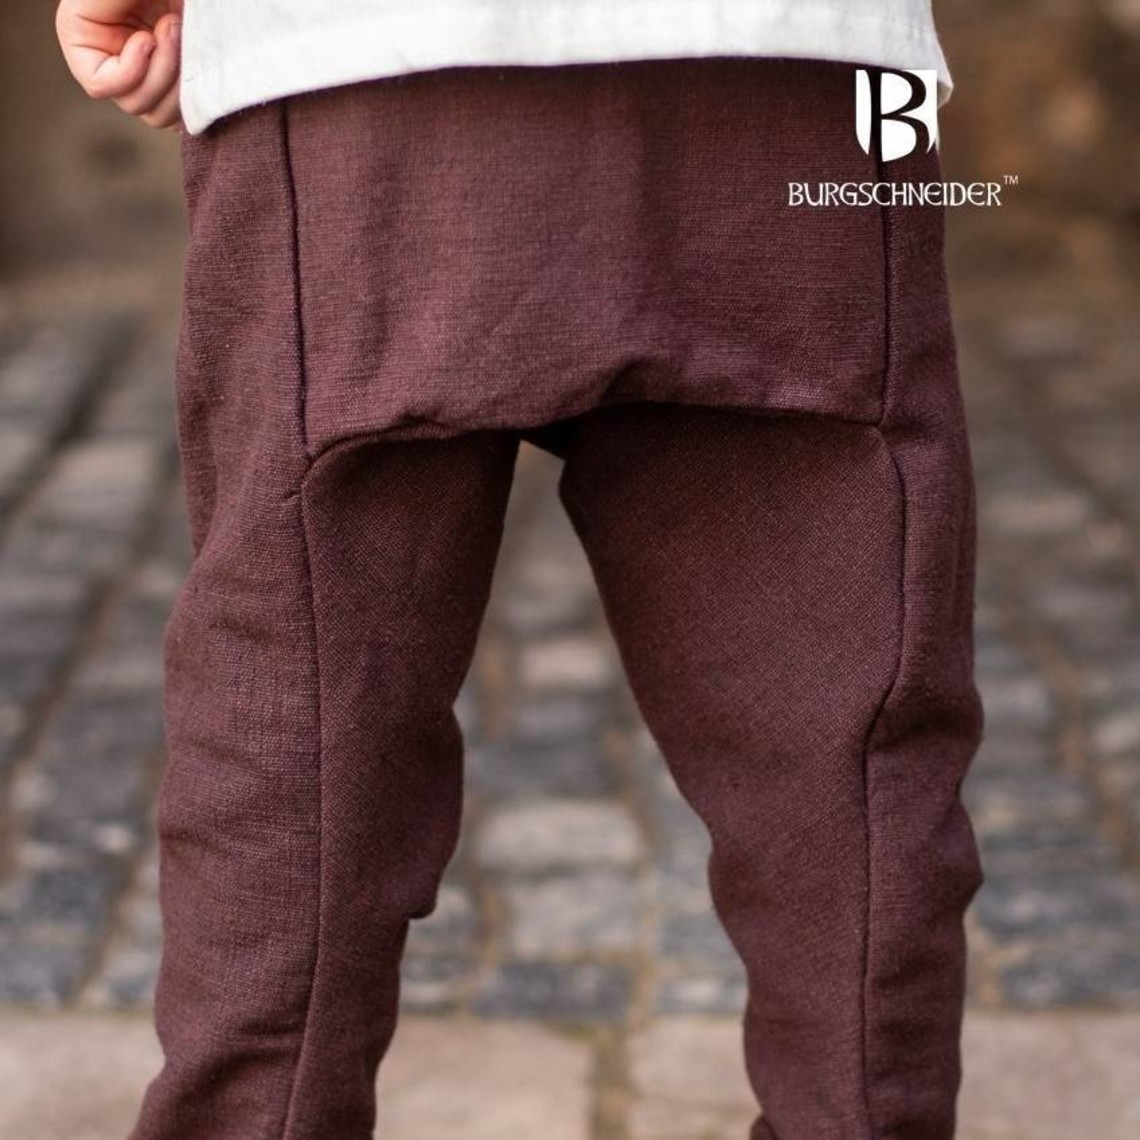 Burgschneider Pantaloni per bambini Thorsberg Ragnarsson, marrone